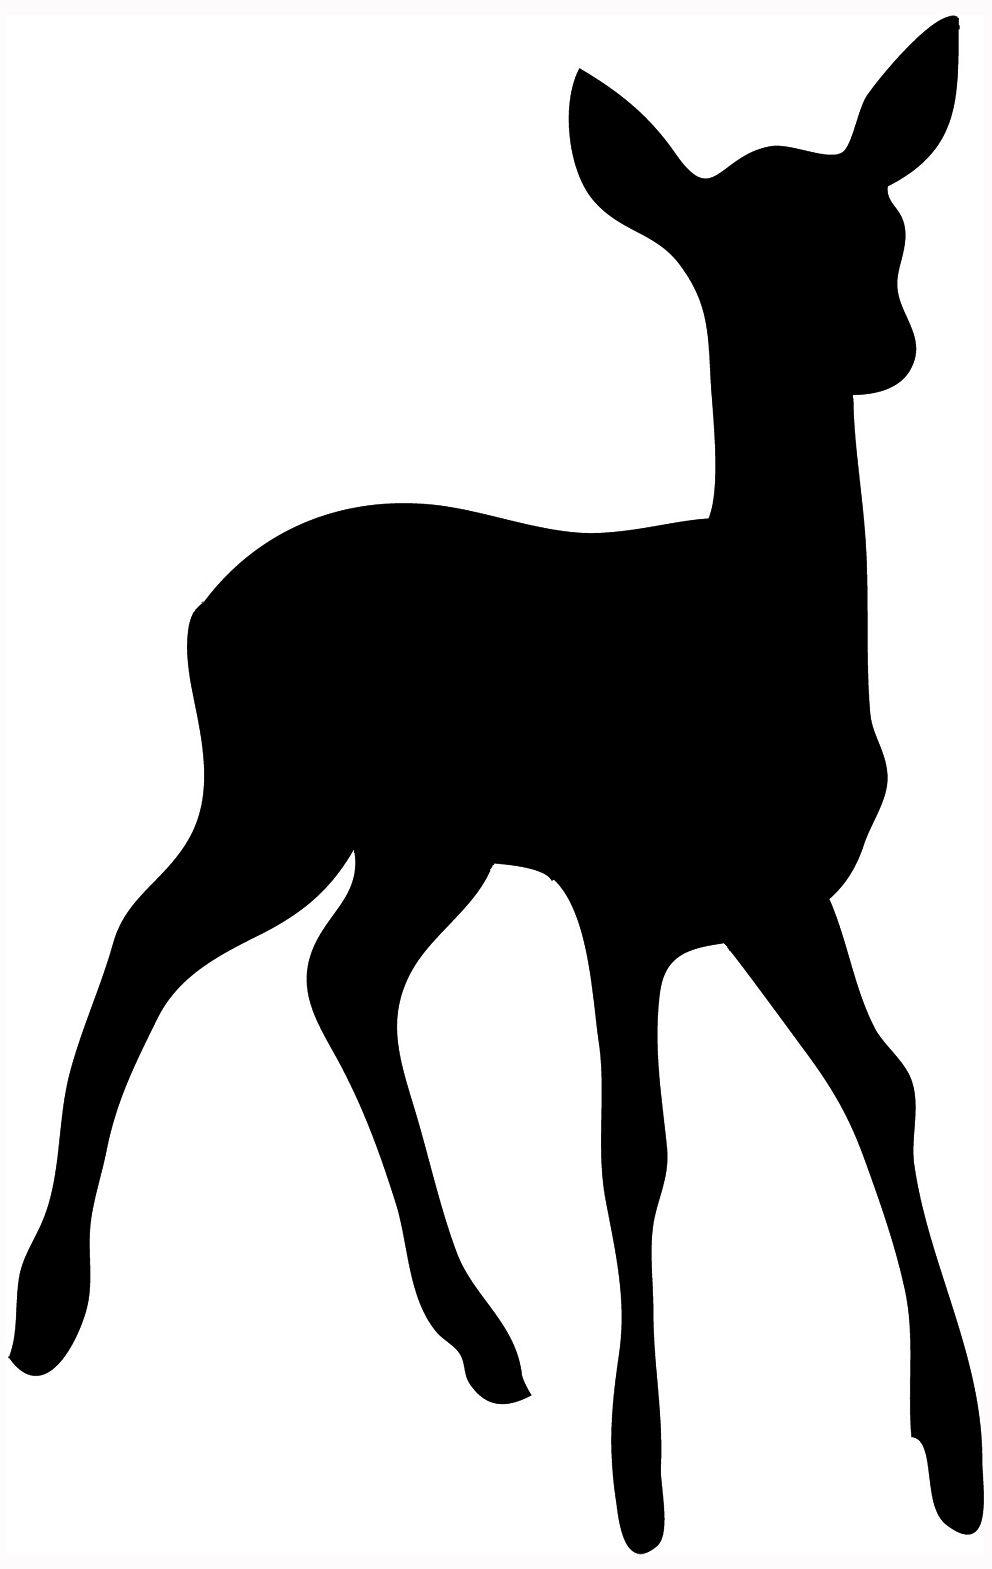 Reindeer Silhouette Clip Art